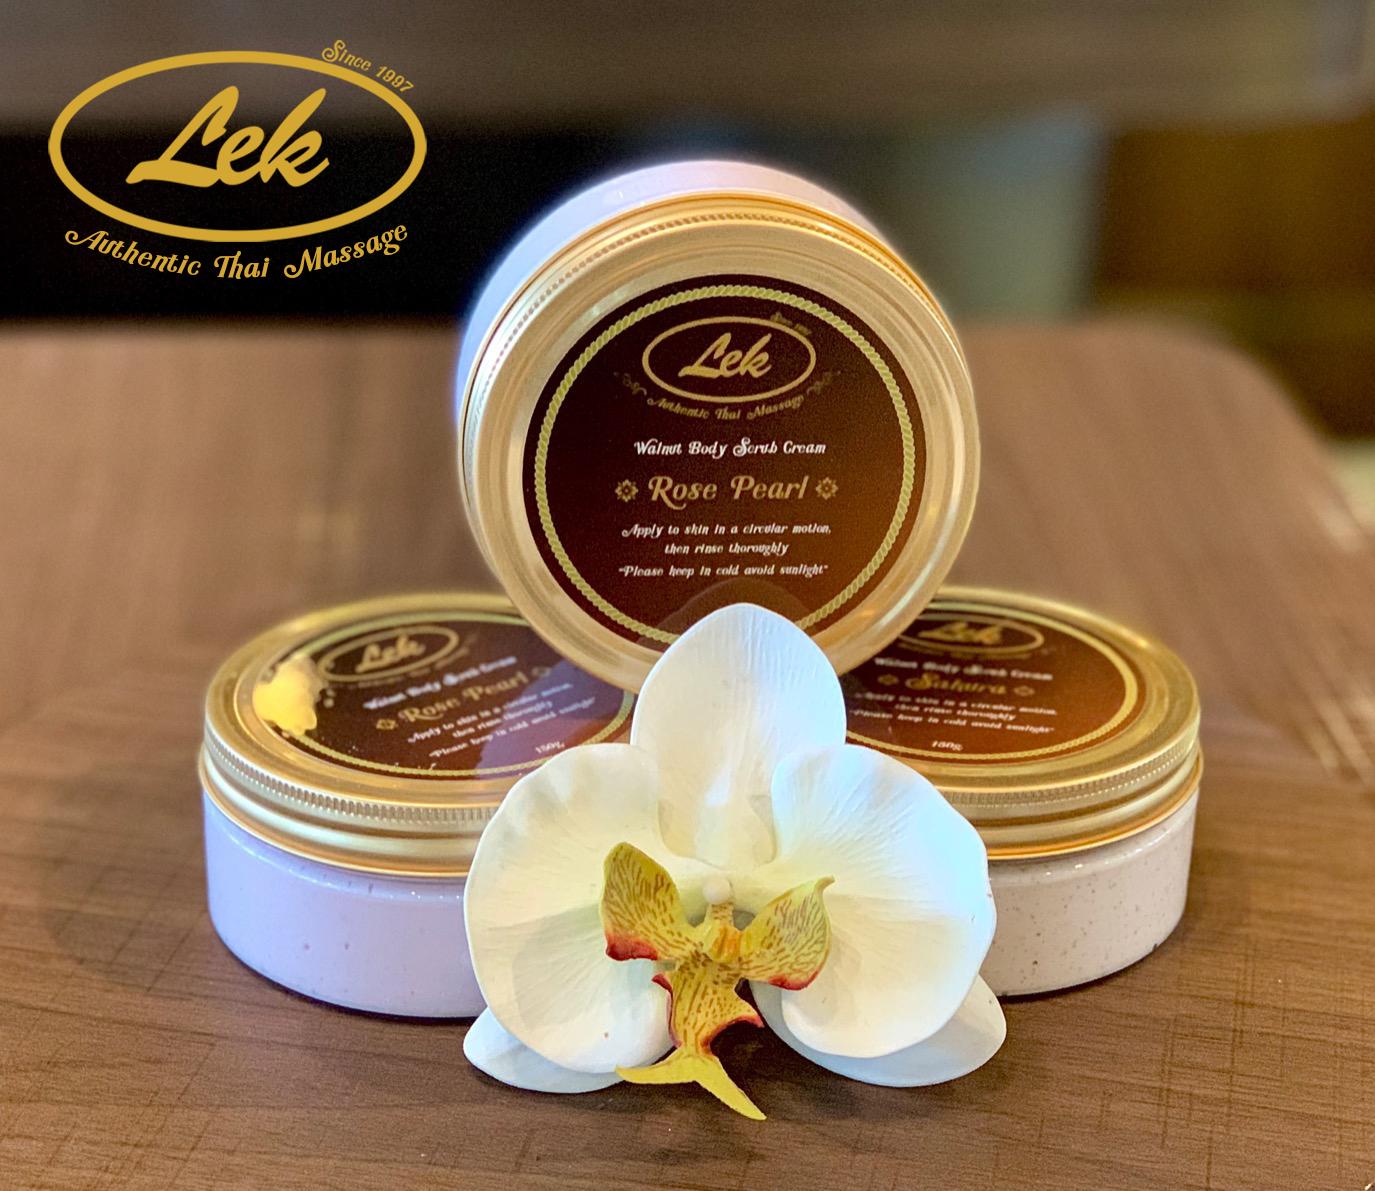 Lek's Body Cream Scrub